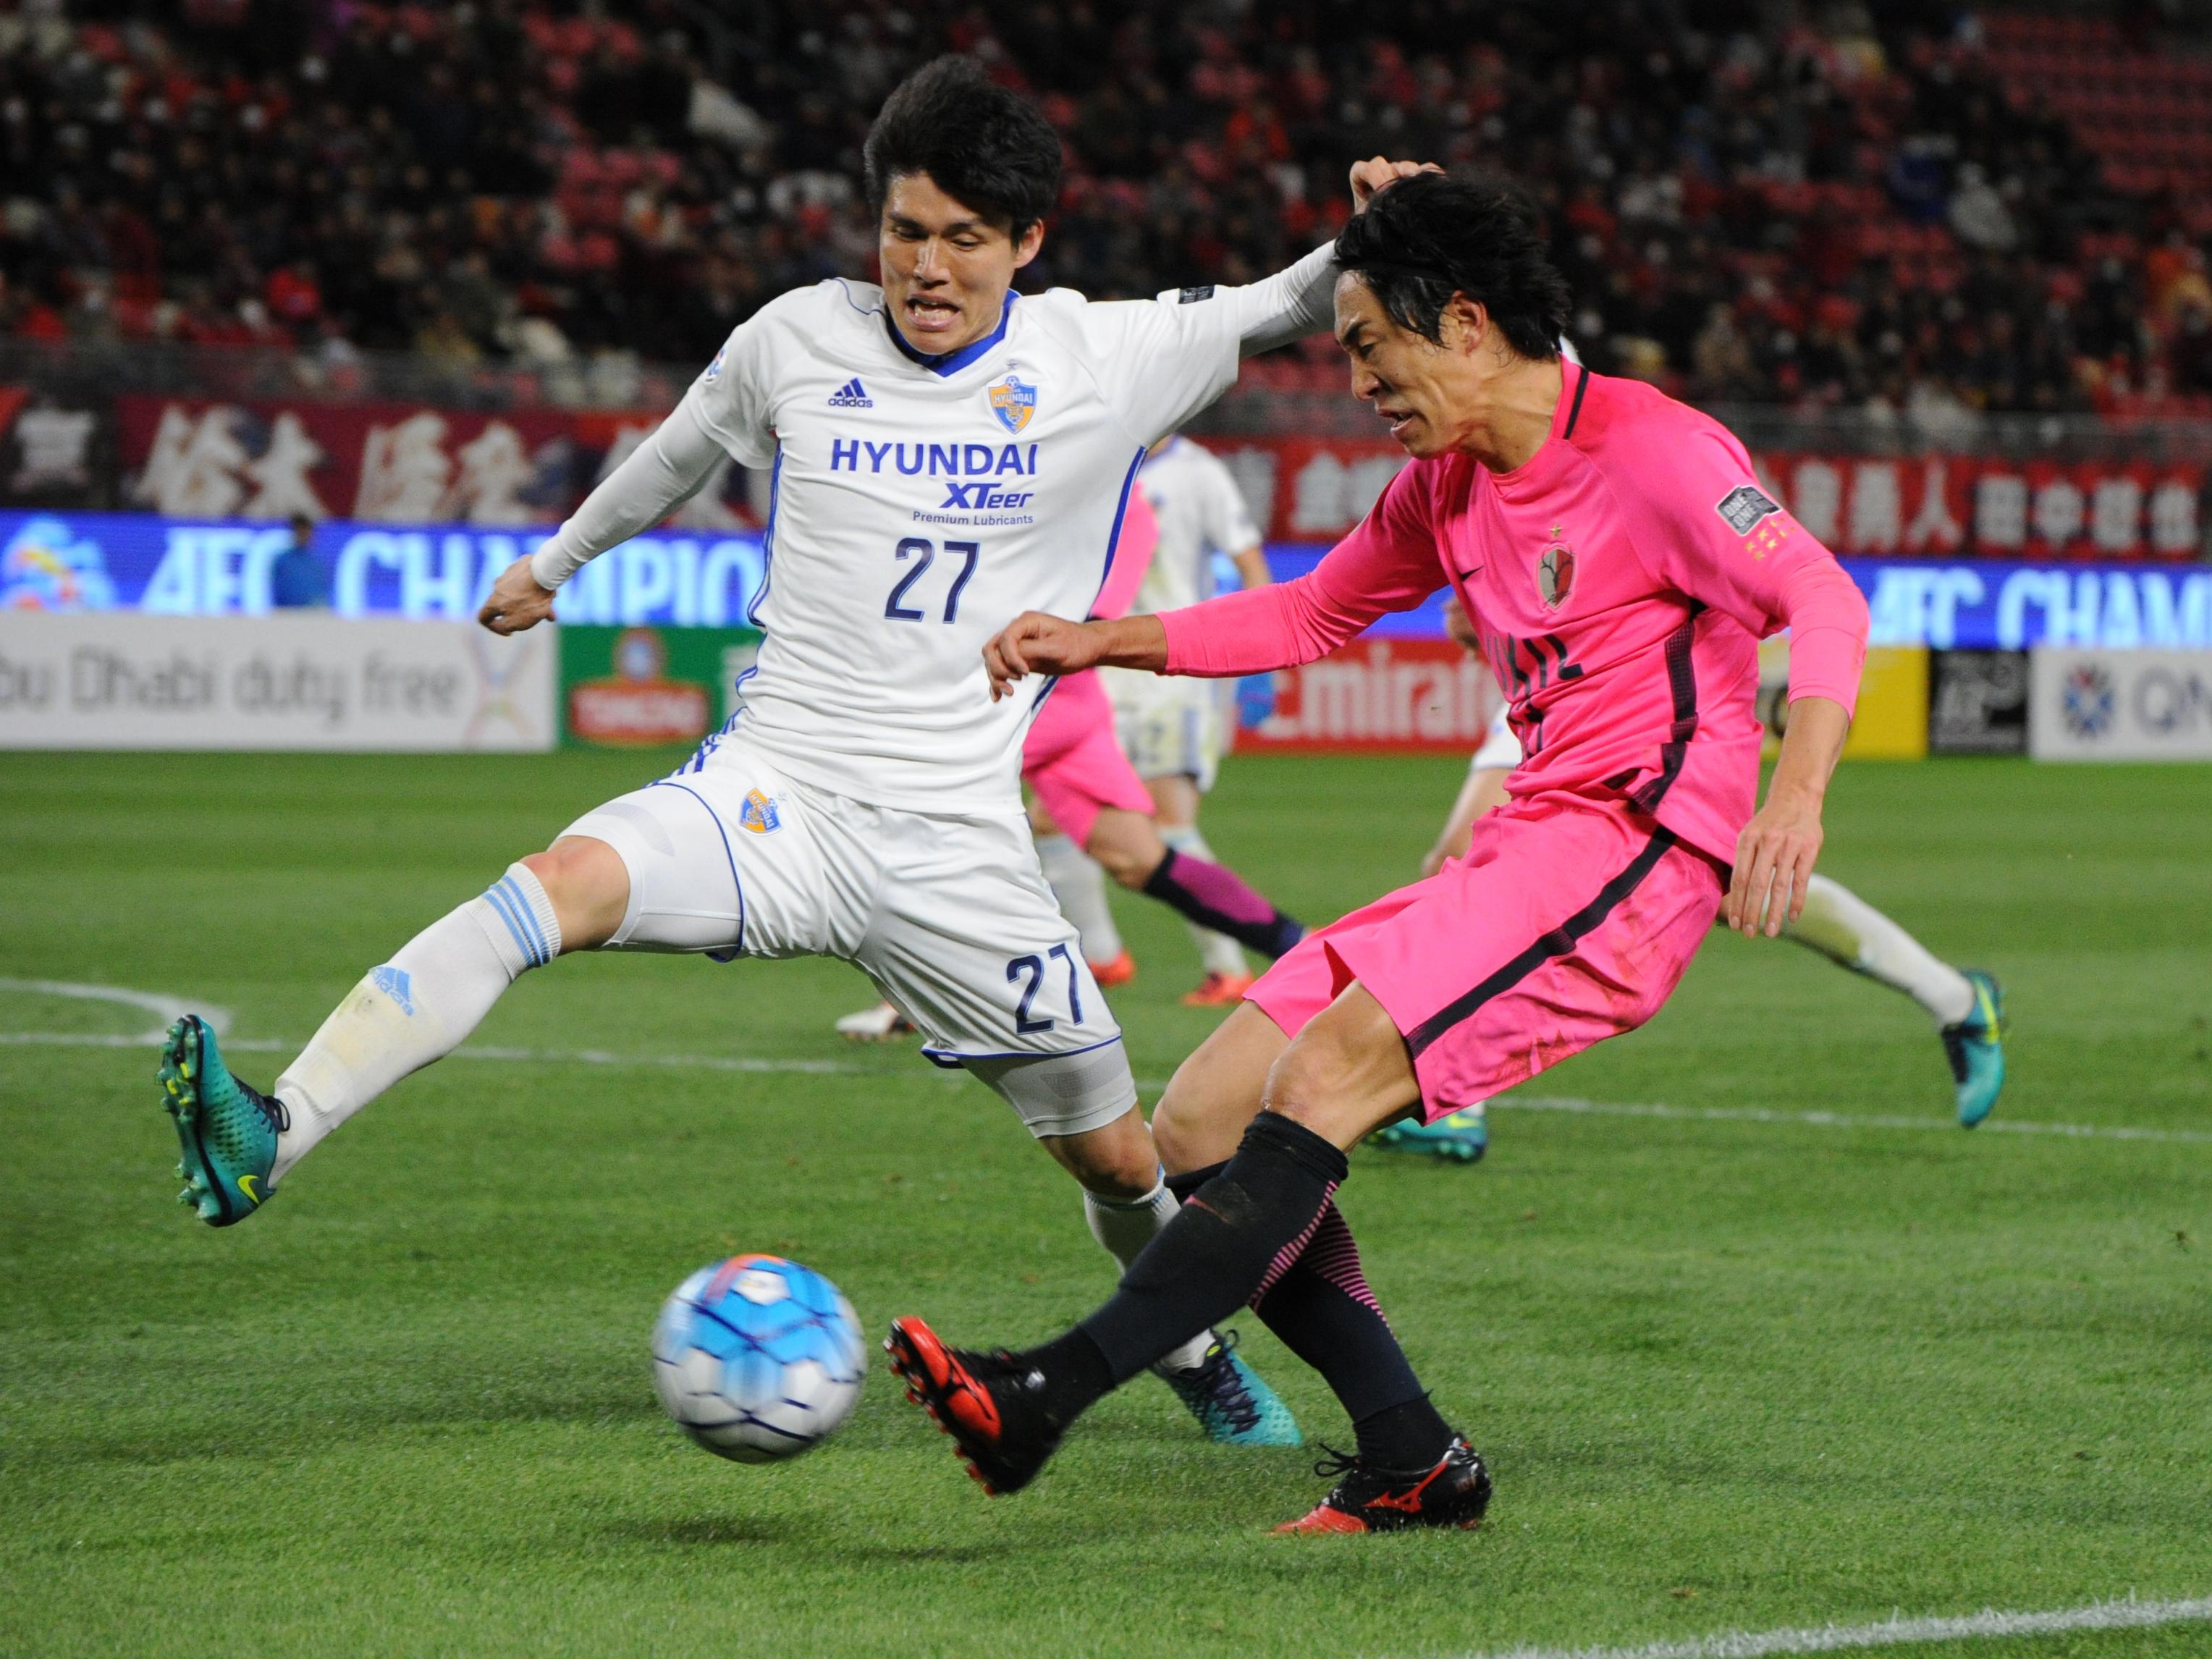 Mu Kanazaki of Kashima Antlers in action during the AFC Champions League Group E match between Kashima Antlers and Ulsan Hyndai at Kashima Soccer Stadium on February 21, 2017 in Kashima, Ibaraki, Japan